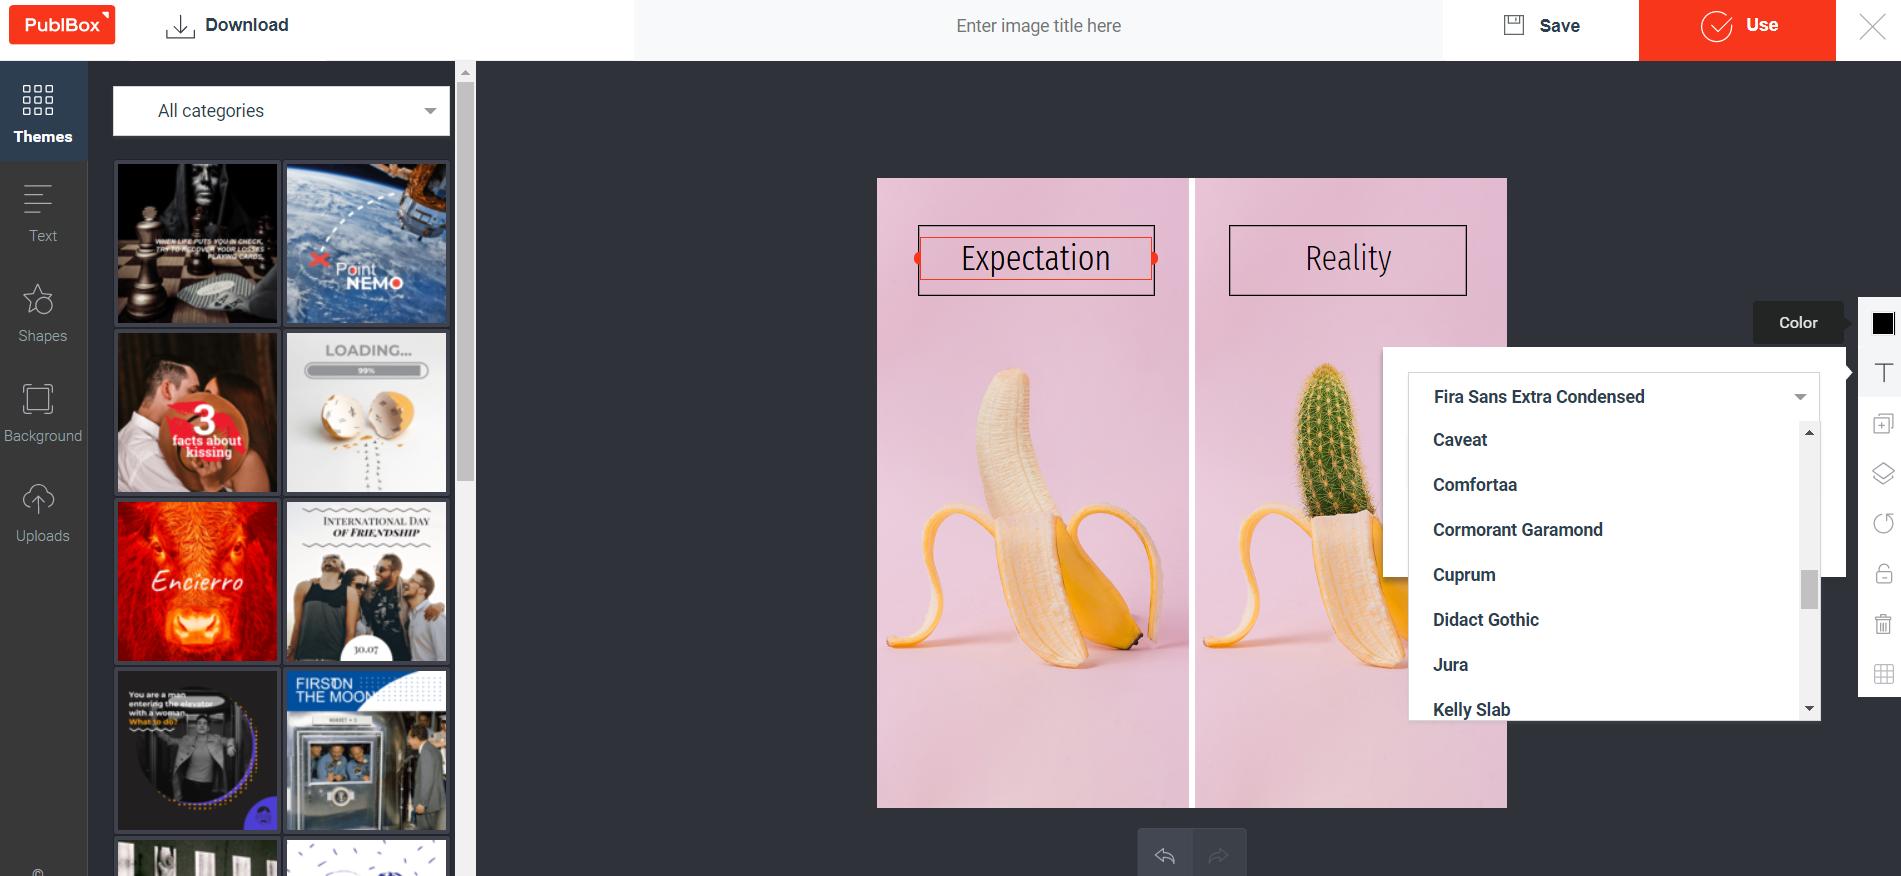 PublBox Demo - Social media graphics designer